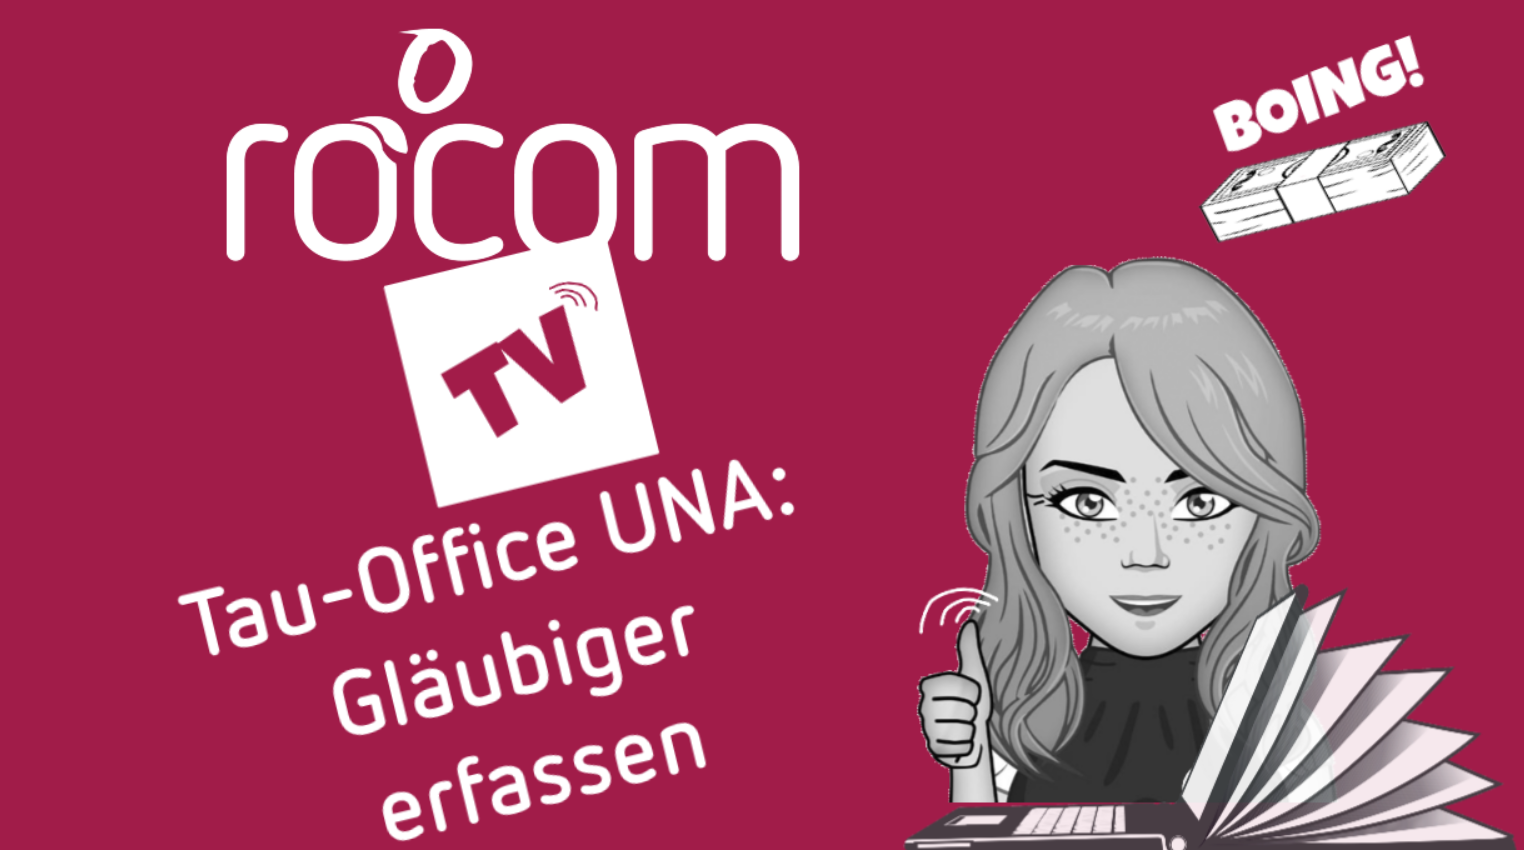 Gläubiger erfassen-software Tau Office UNA - screenshot